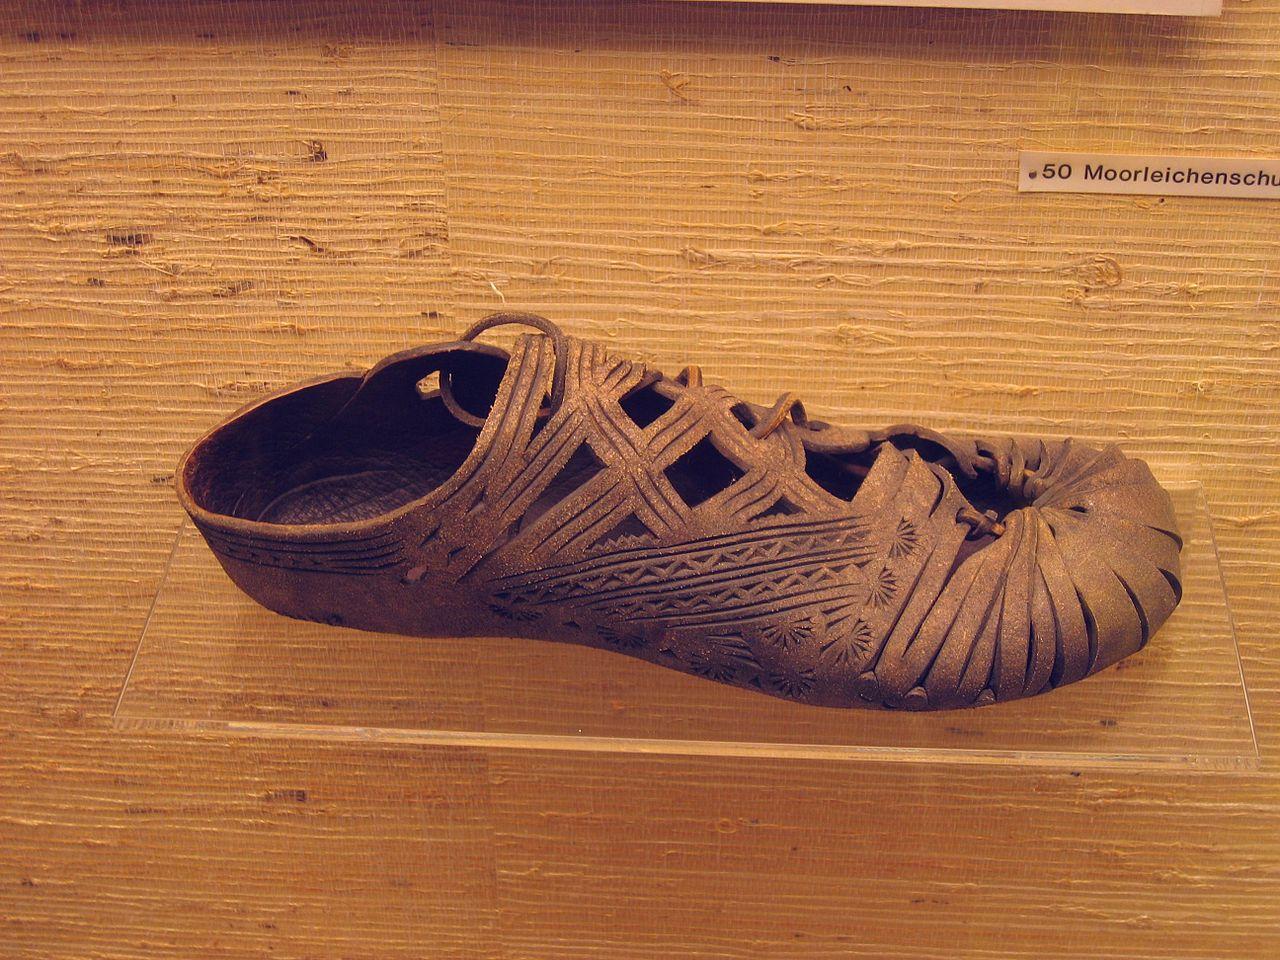 Wet Under Shoe Insert Asics Gel Resolution